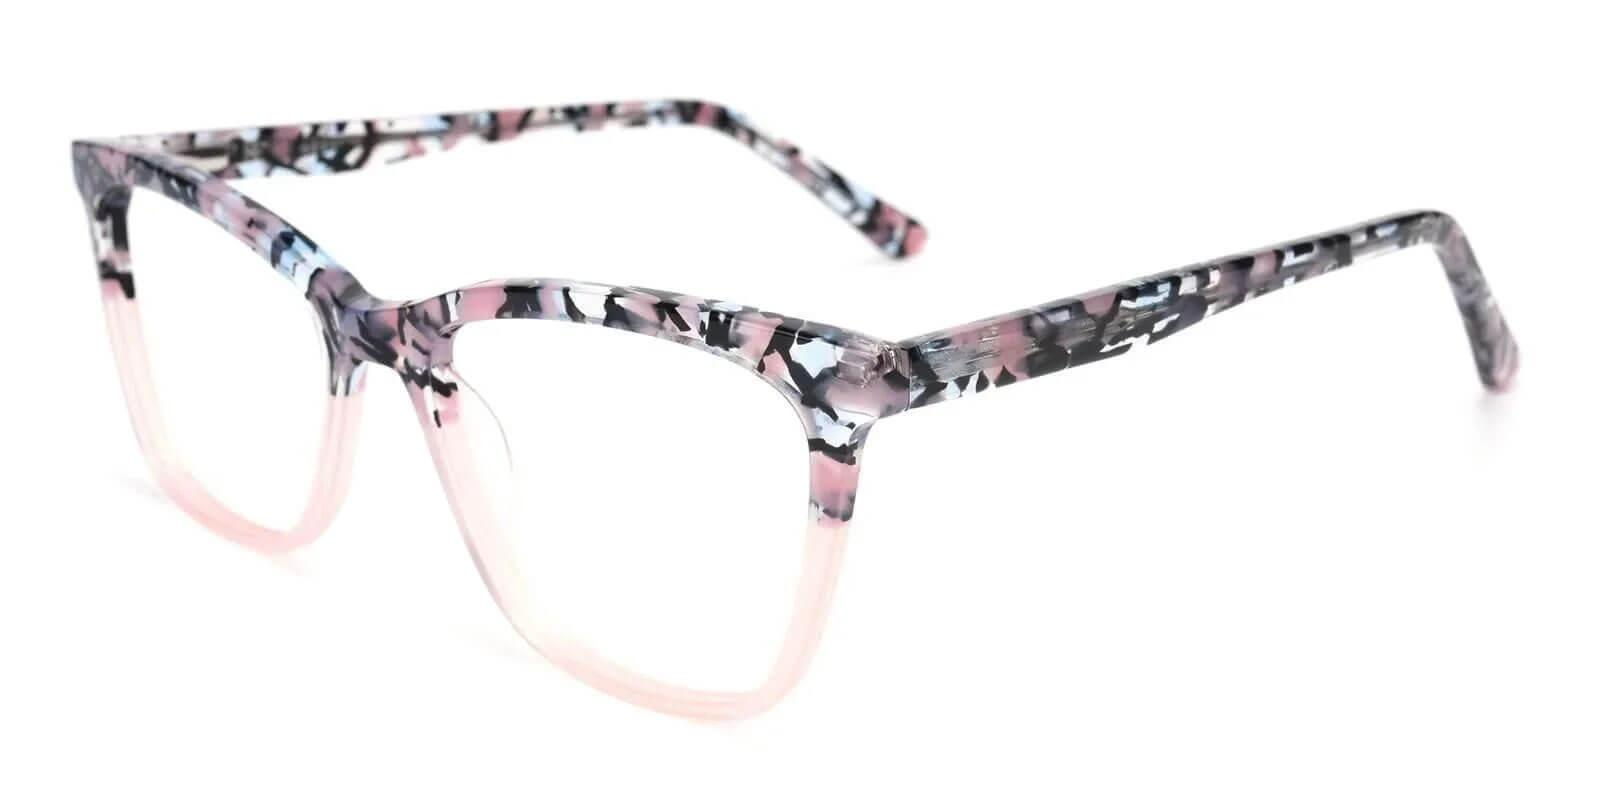 Masser Pink Acetate Eyeglasses , UniversalBridgeFit Frames from ABBE Glasses